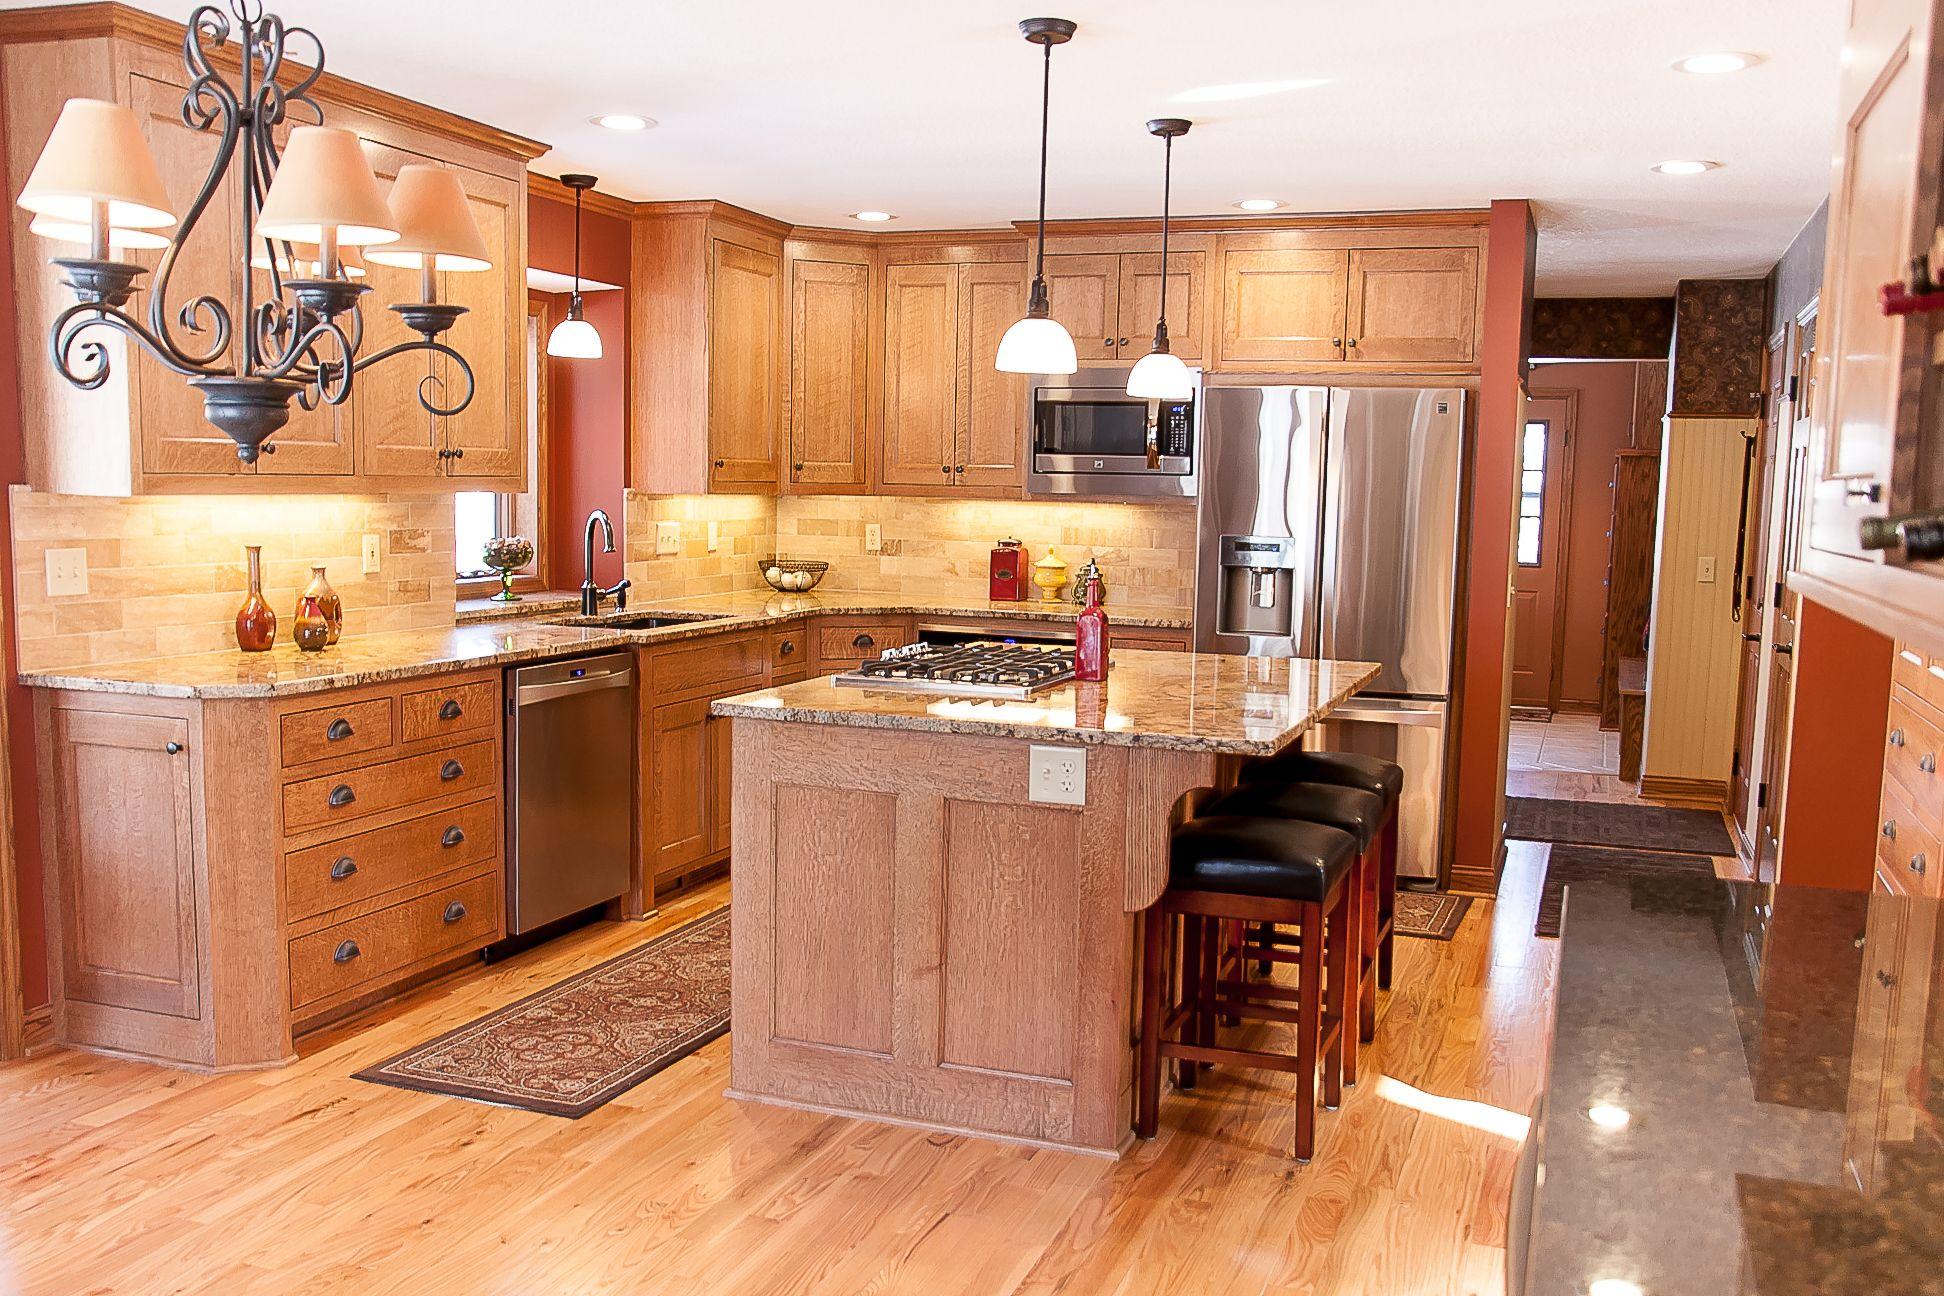 Quarter Sawn Oak Kitchen Cabinetry Natural Finish Oak Kitchen Home Remodeling Kitchen Cabinetry